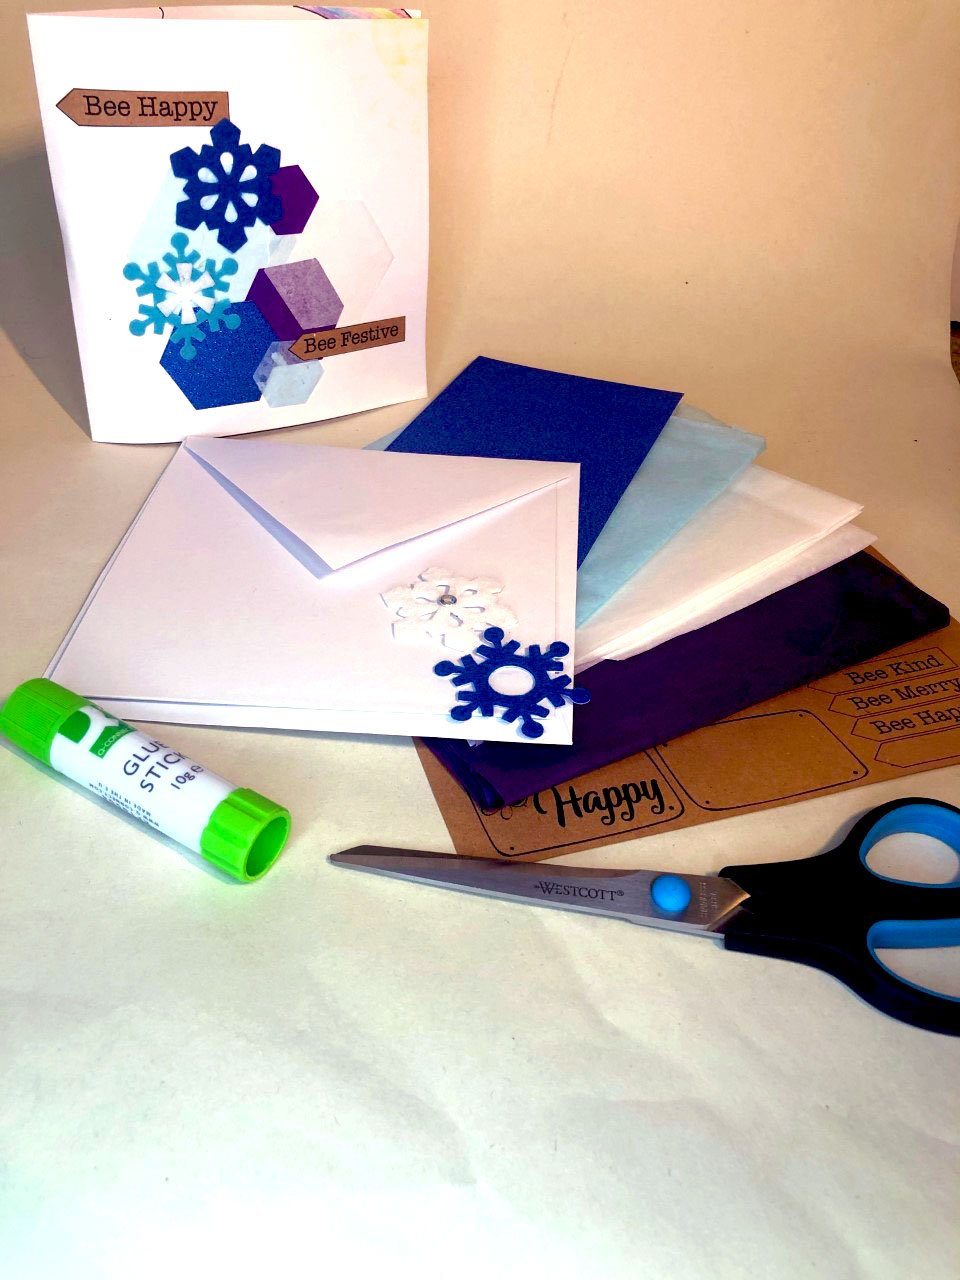 Greetings Card snowflakes & hives edited